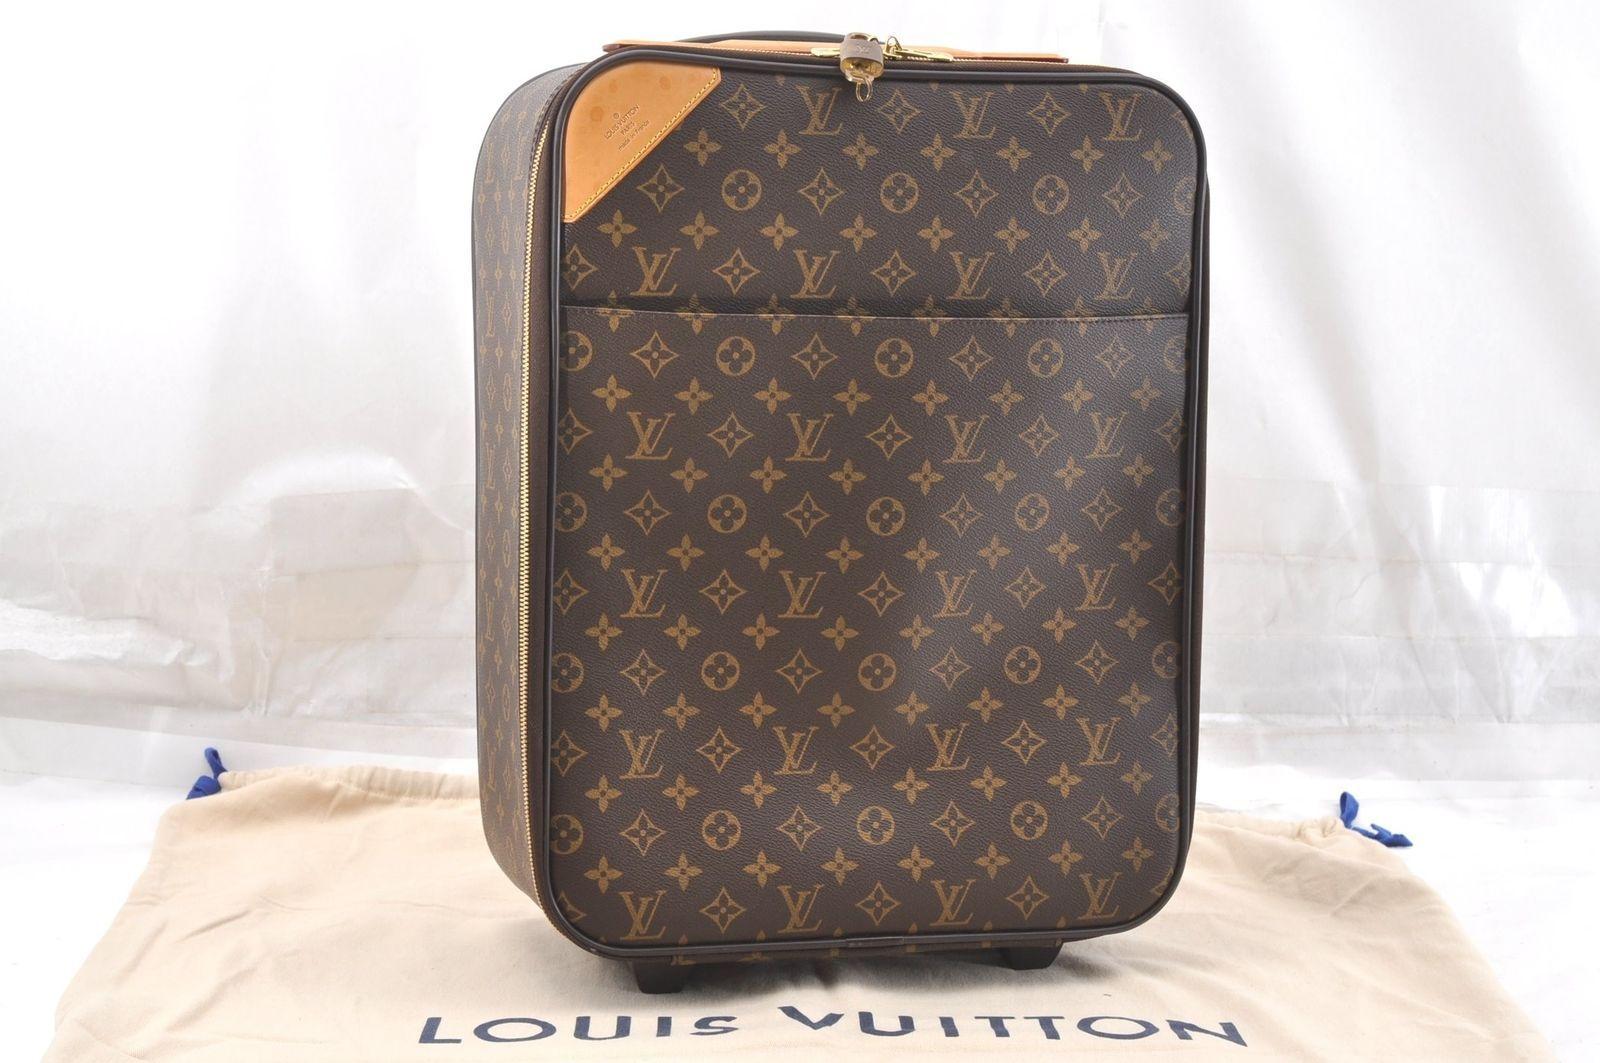 Authentic Louis Vuitton Monogram Pegase 45 Travel Carry Bag M23293 Lv 58323 Travel Bags Carry On Louis Vuitton Travel Bags Louis Vuitton Monogram